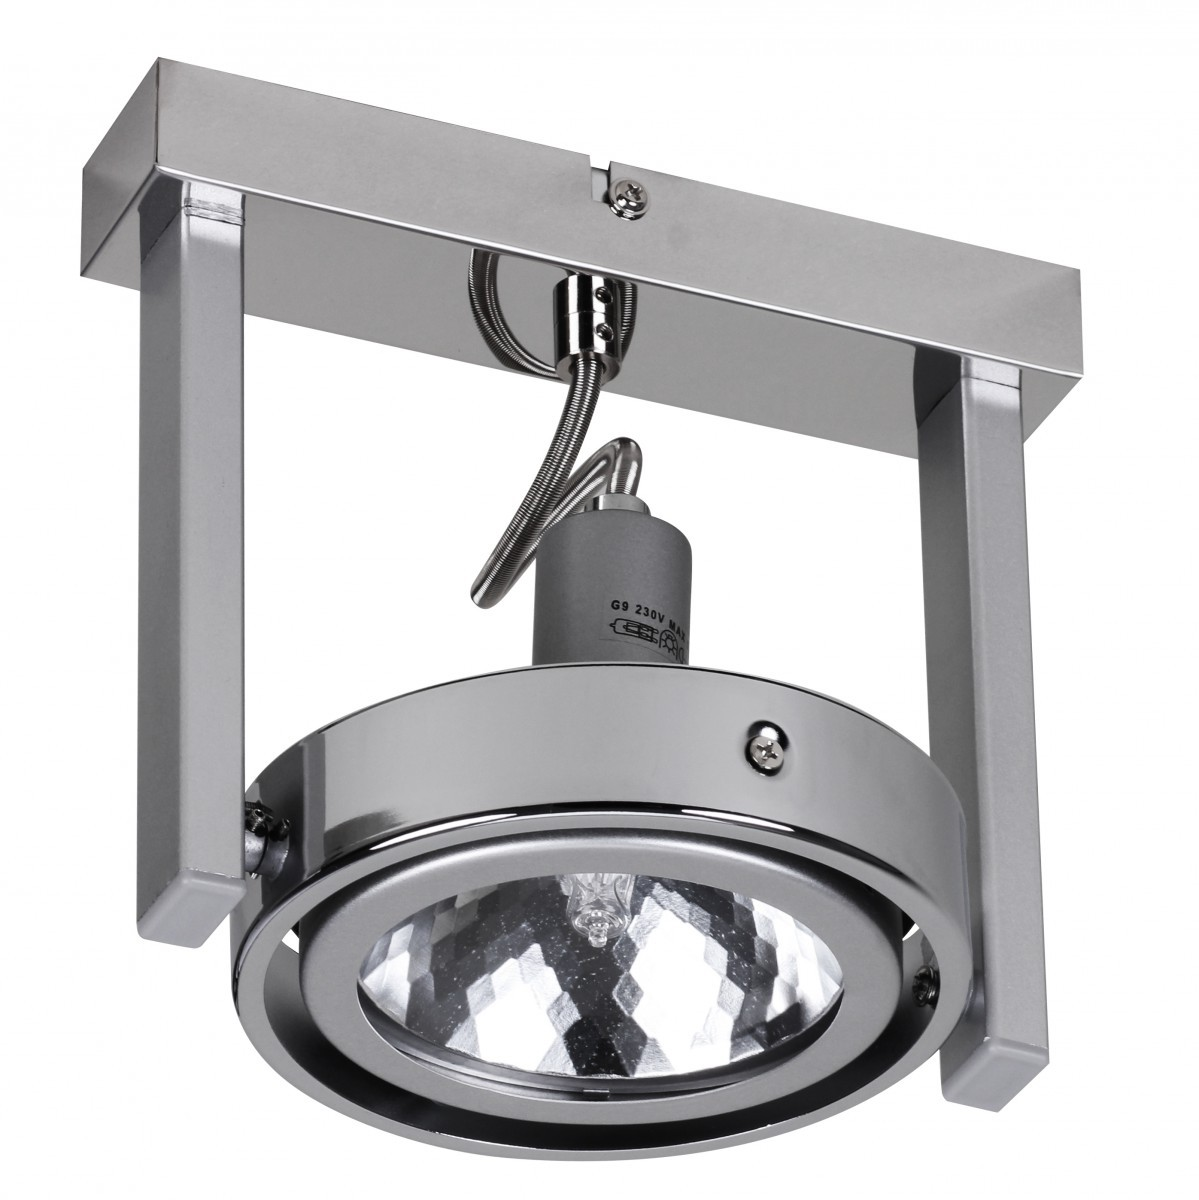 finebuy design deckenlampe spot alu chrom 1 flammig g9 52w eek c 40362. Black Bedroom Furniture Sets. Home Design Ideas